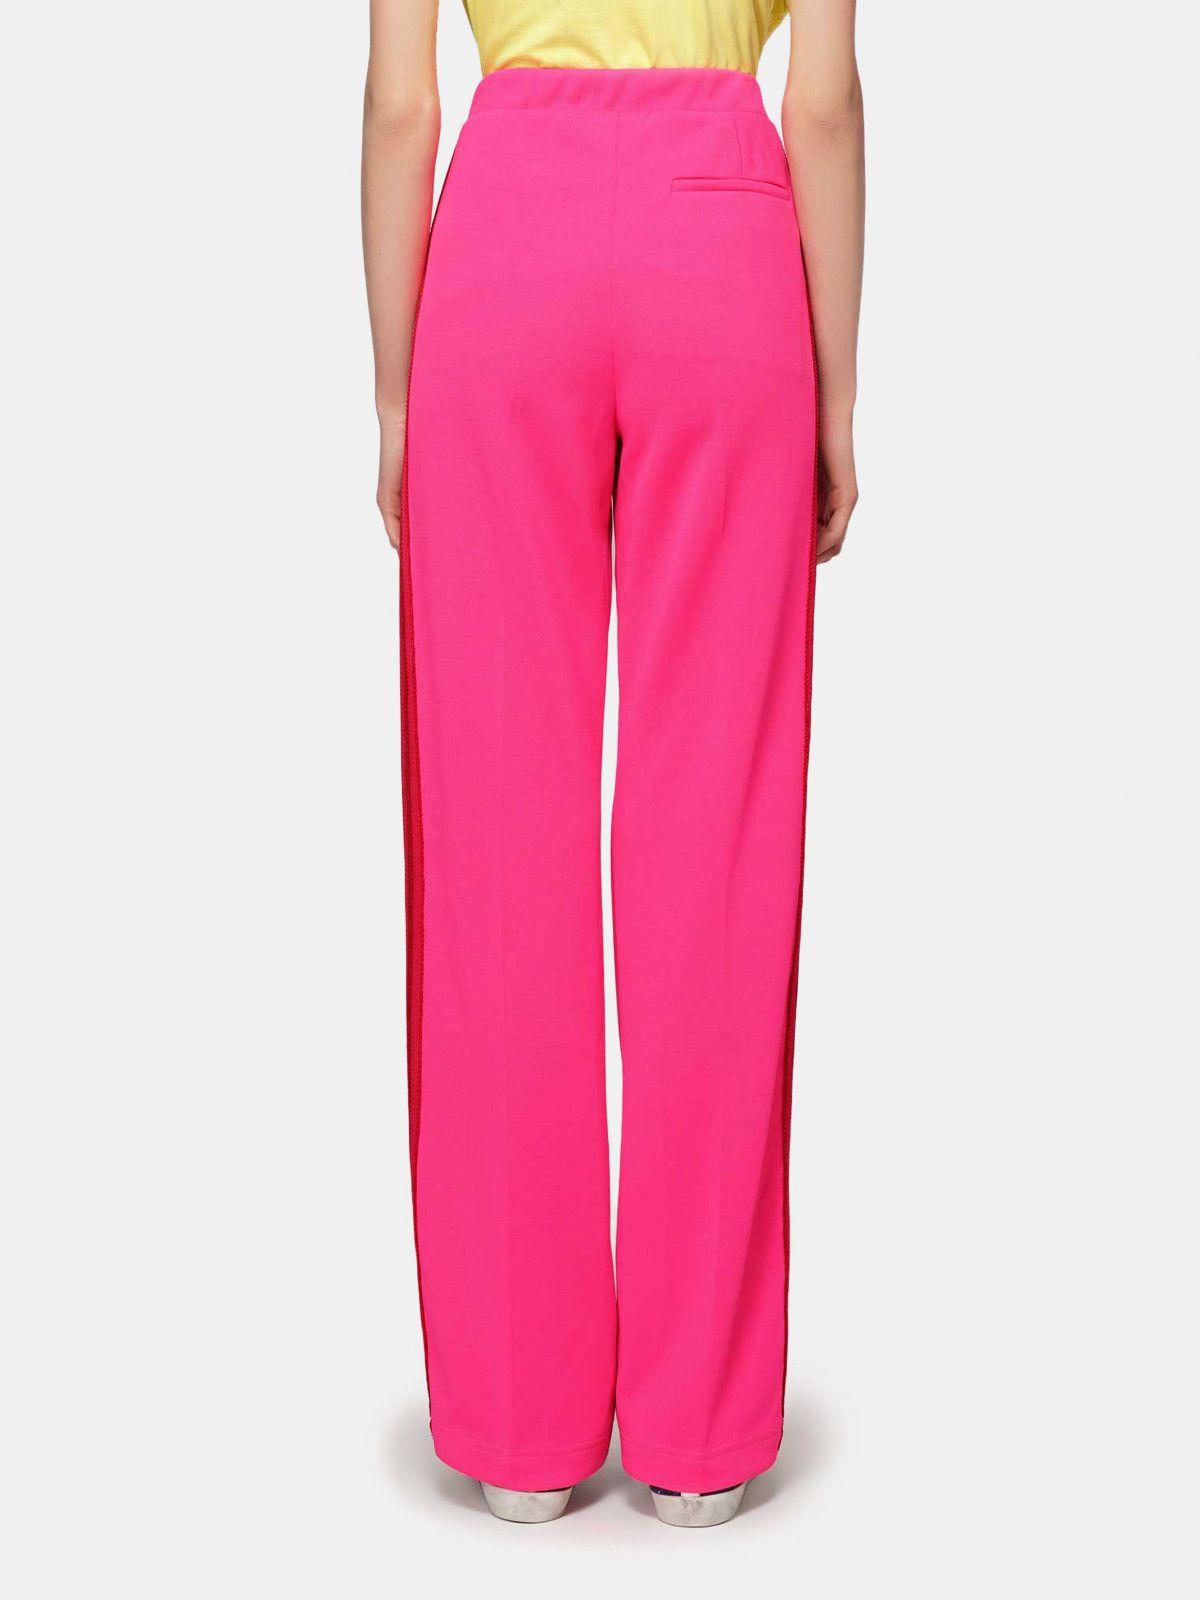 Golden Goose - Pantalon Kelly rose en tissu technique et taille en lurex in